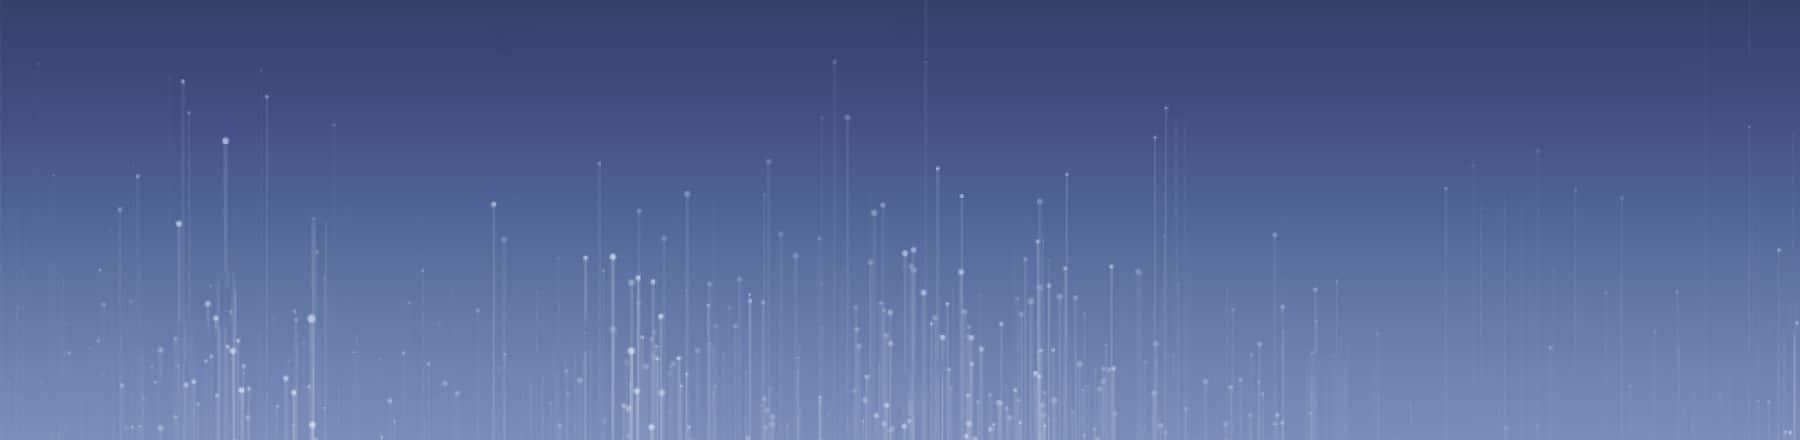 Making sense of your data